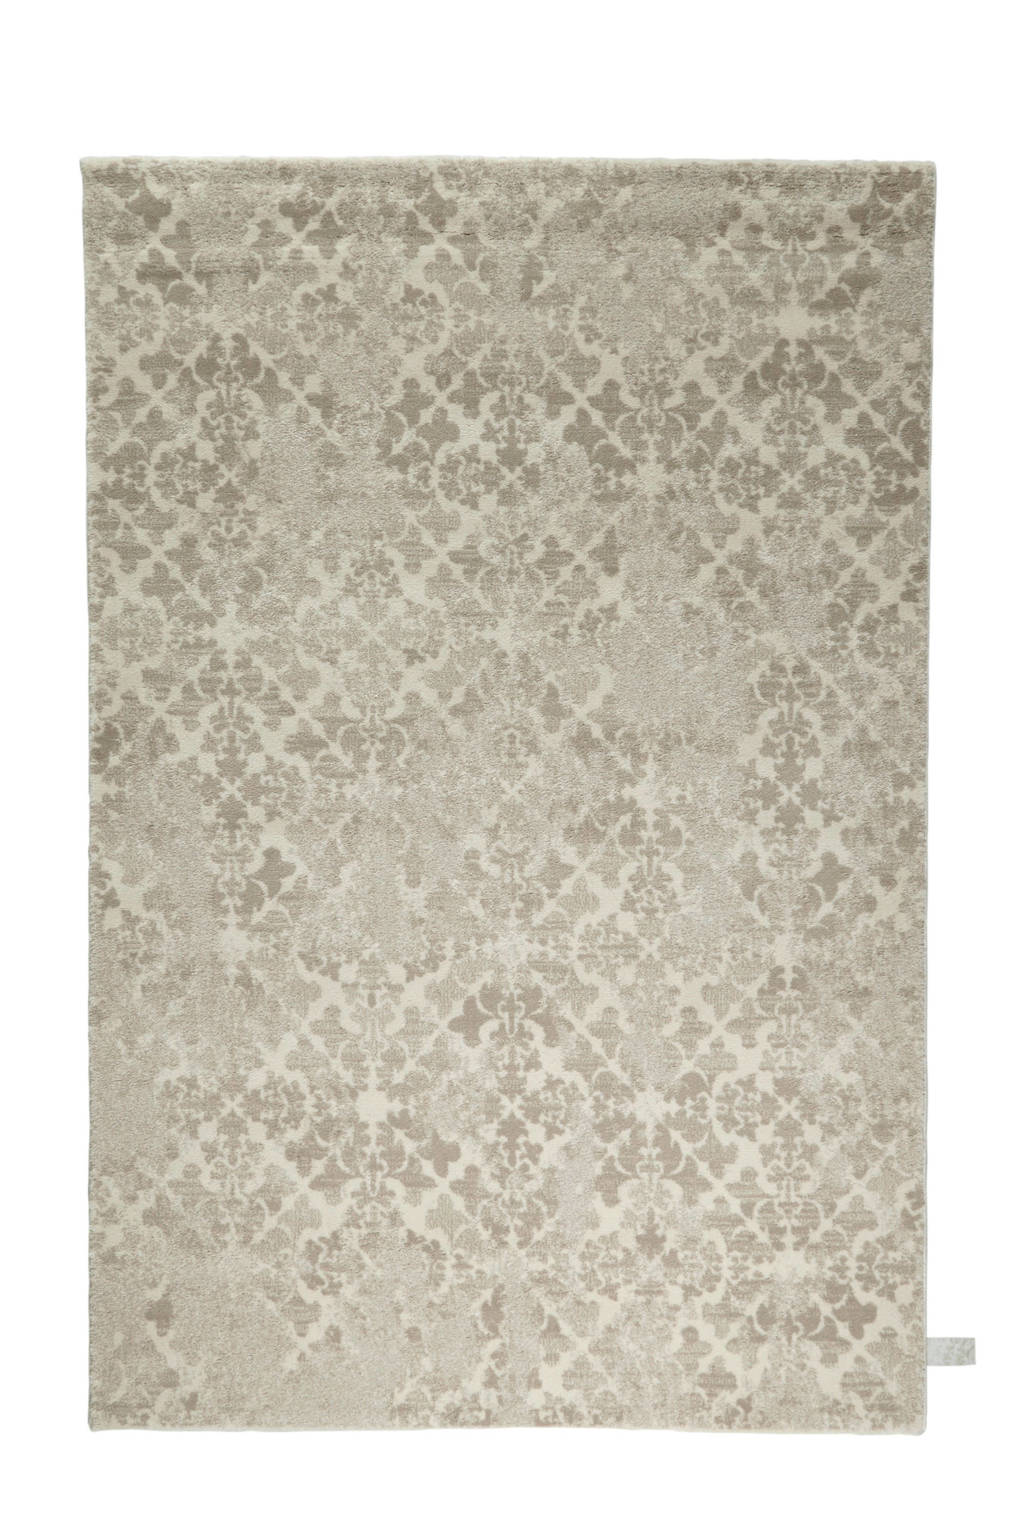 whkmp's own Vloerkleed  (230x160 cm), Beige/crême